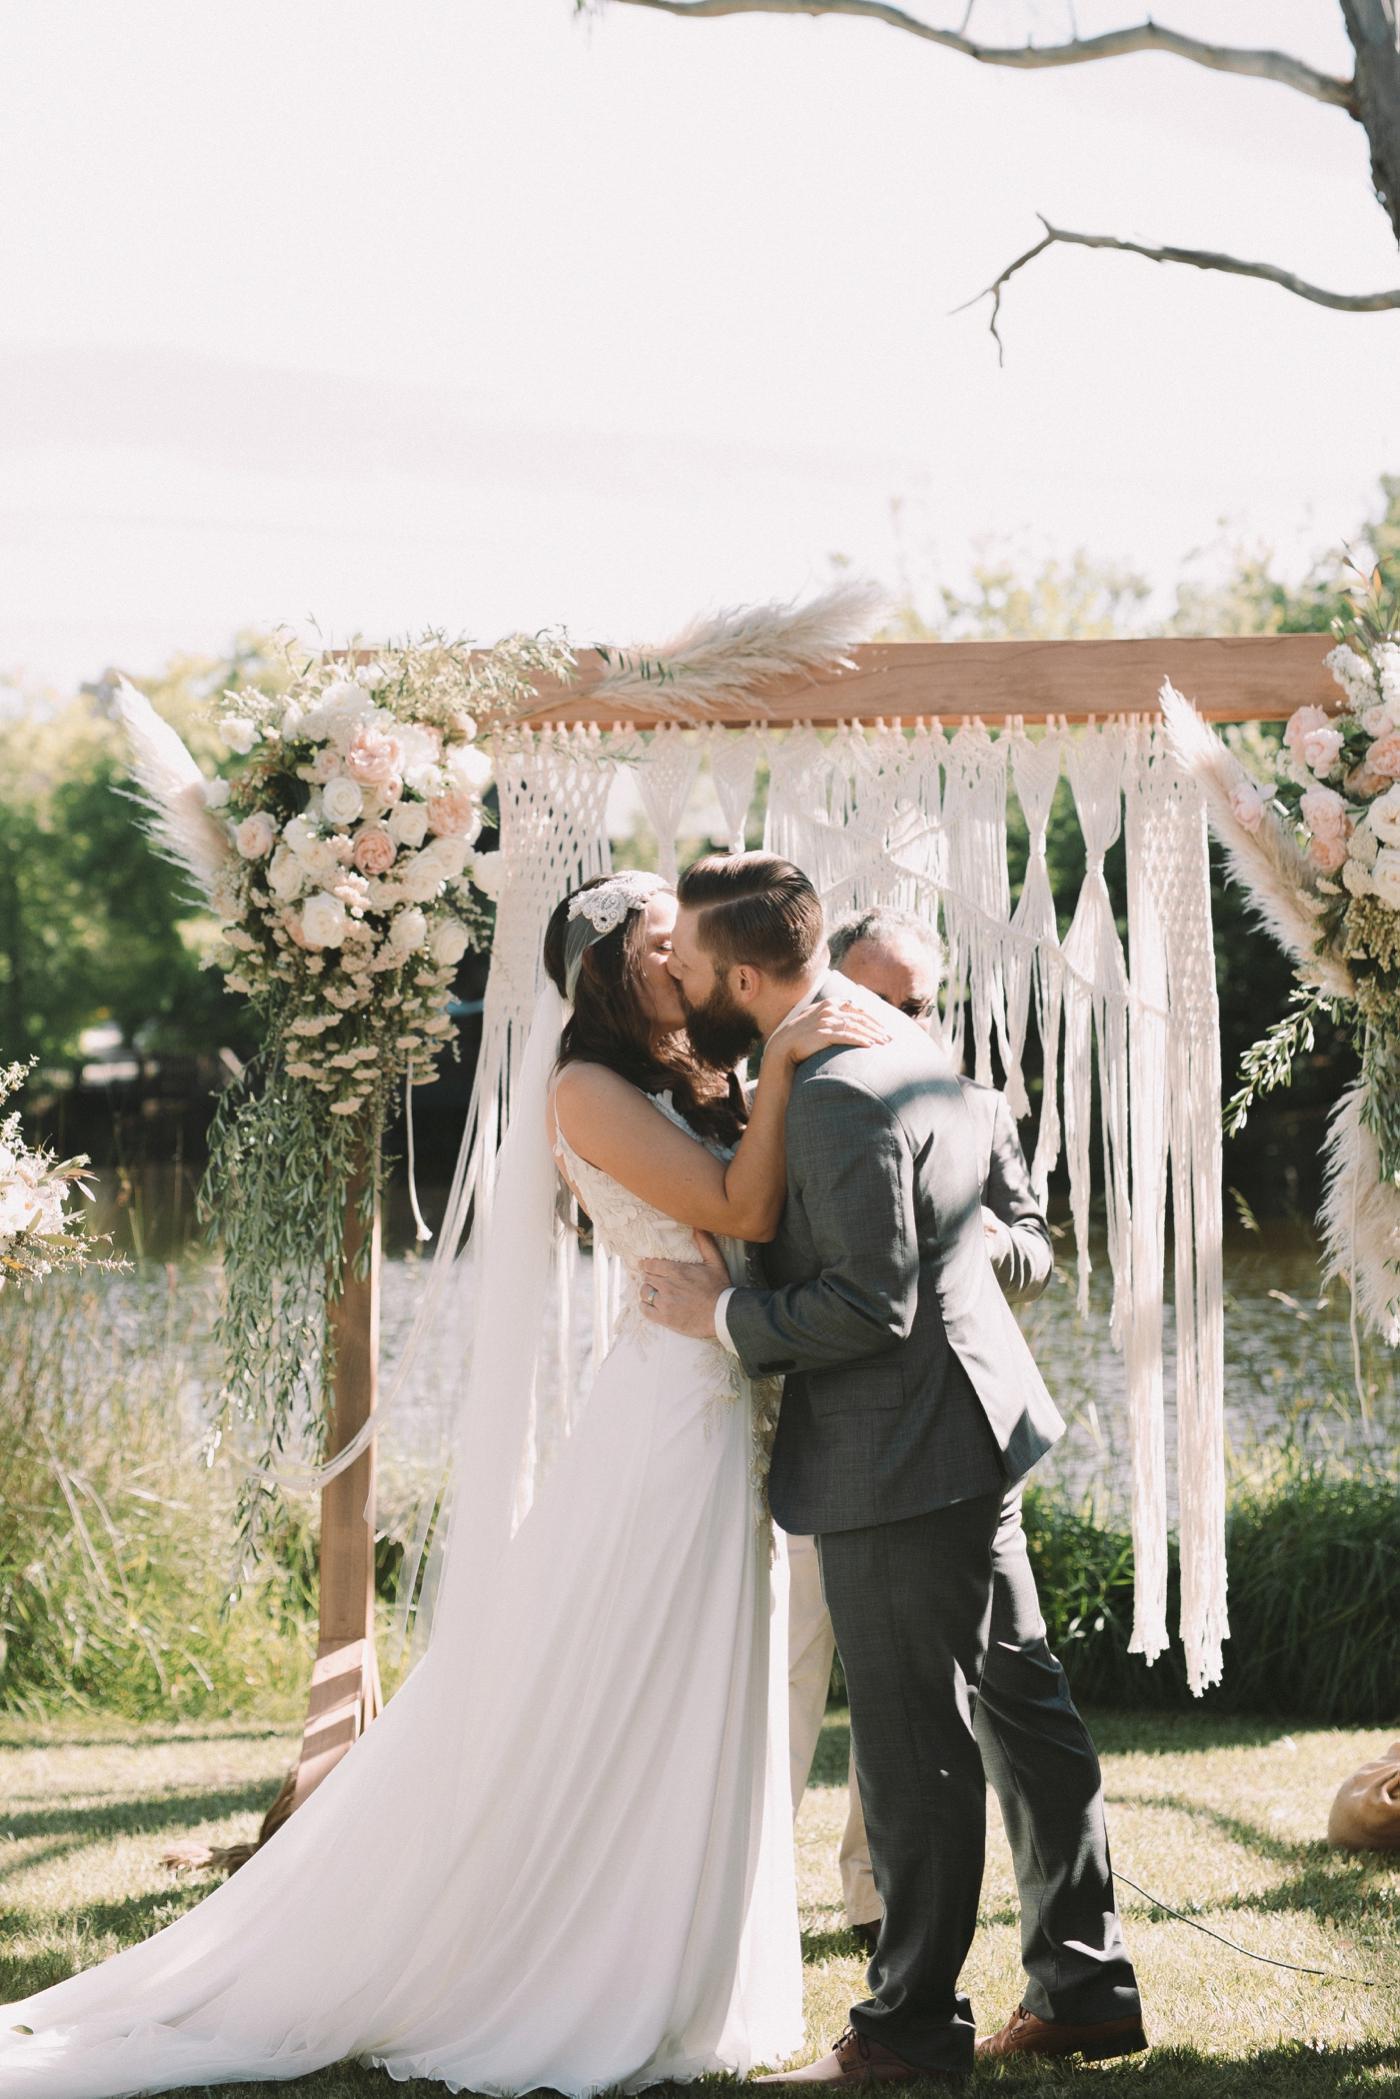 Maddy & Wes - K1 by Geoff Hardy Wedding - Adelaide Wedding Photographer - Natural wedding photography in Adelaide - Katherine Schultz_0028.jpg